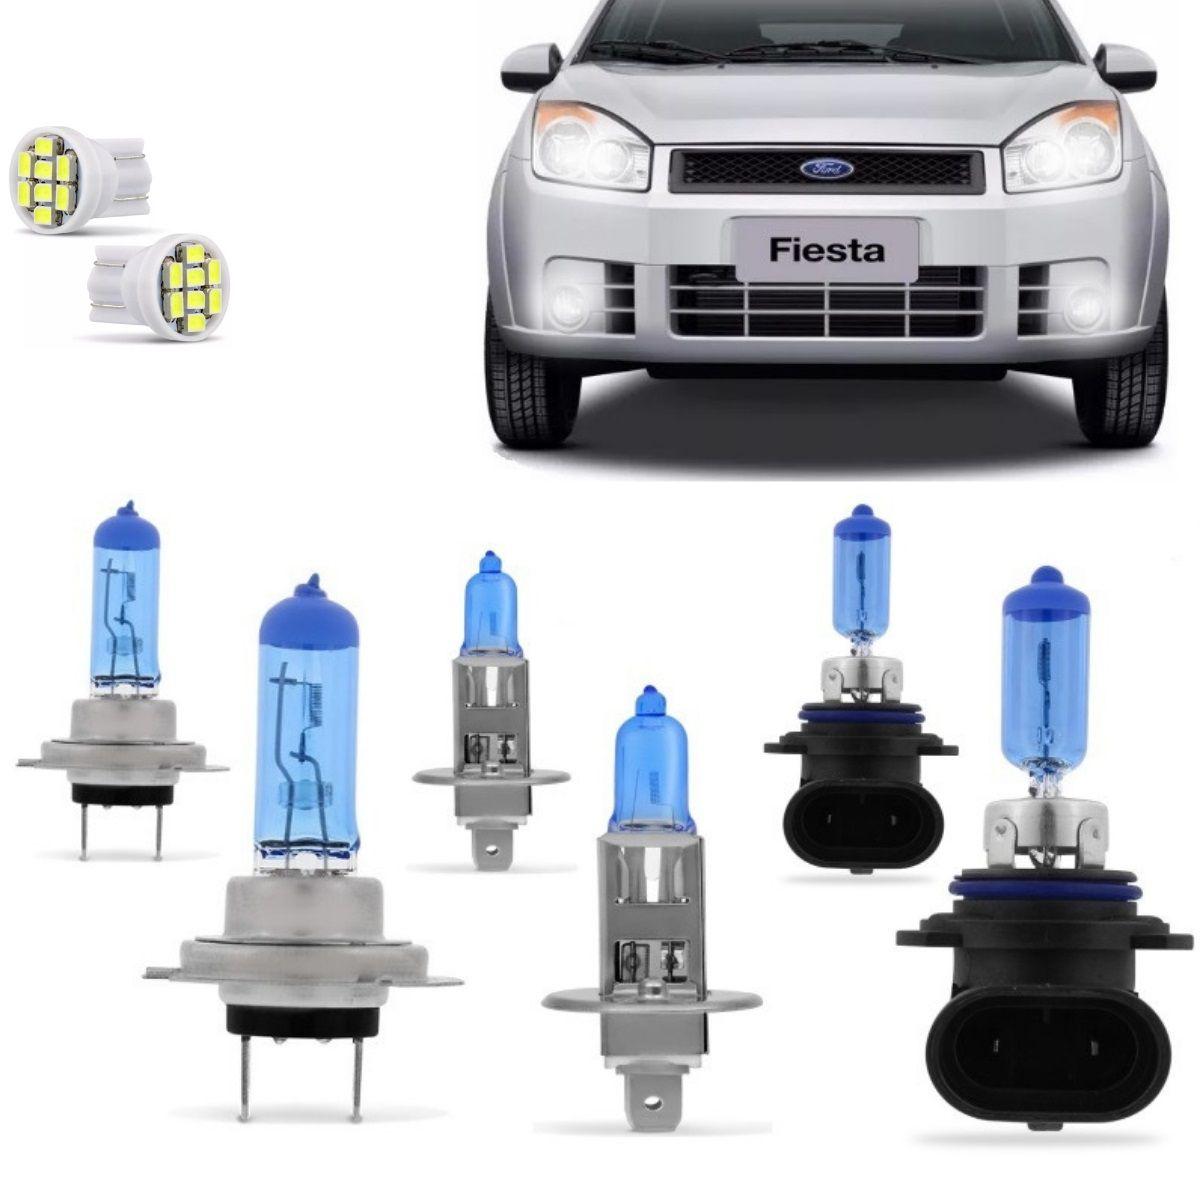 Kit Lampadas Fiesta Hatch Sedan 2007 2008 2009 2010 Super Brancas Farol H7 H1 Milha HB4 9006 - Techone 8500k 55w Inmetro